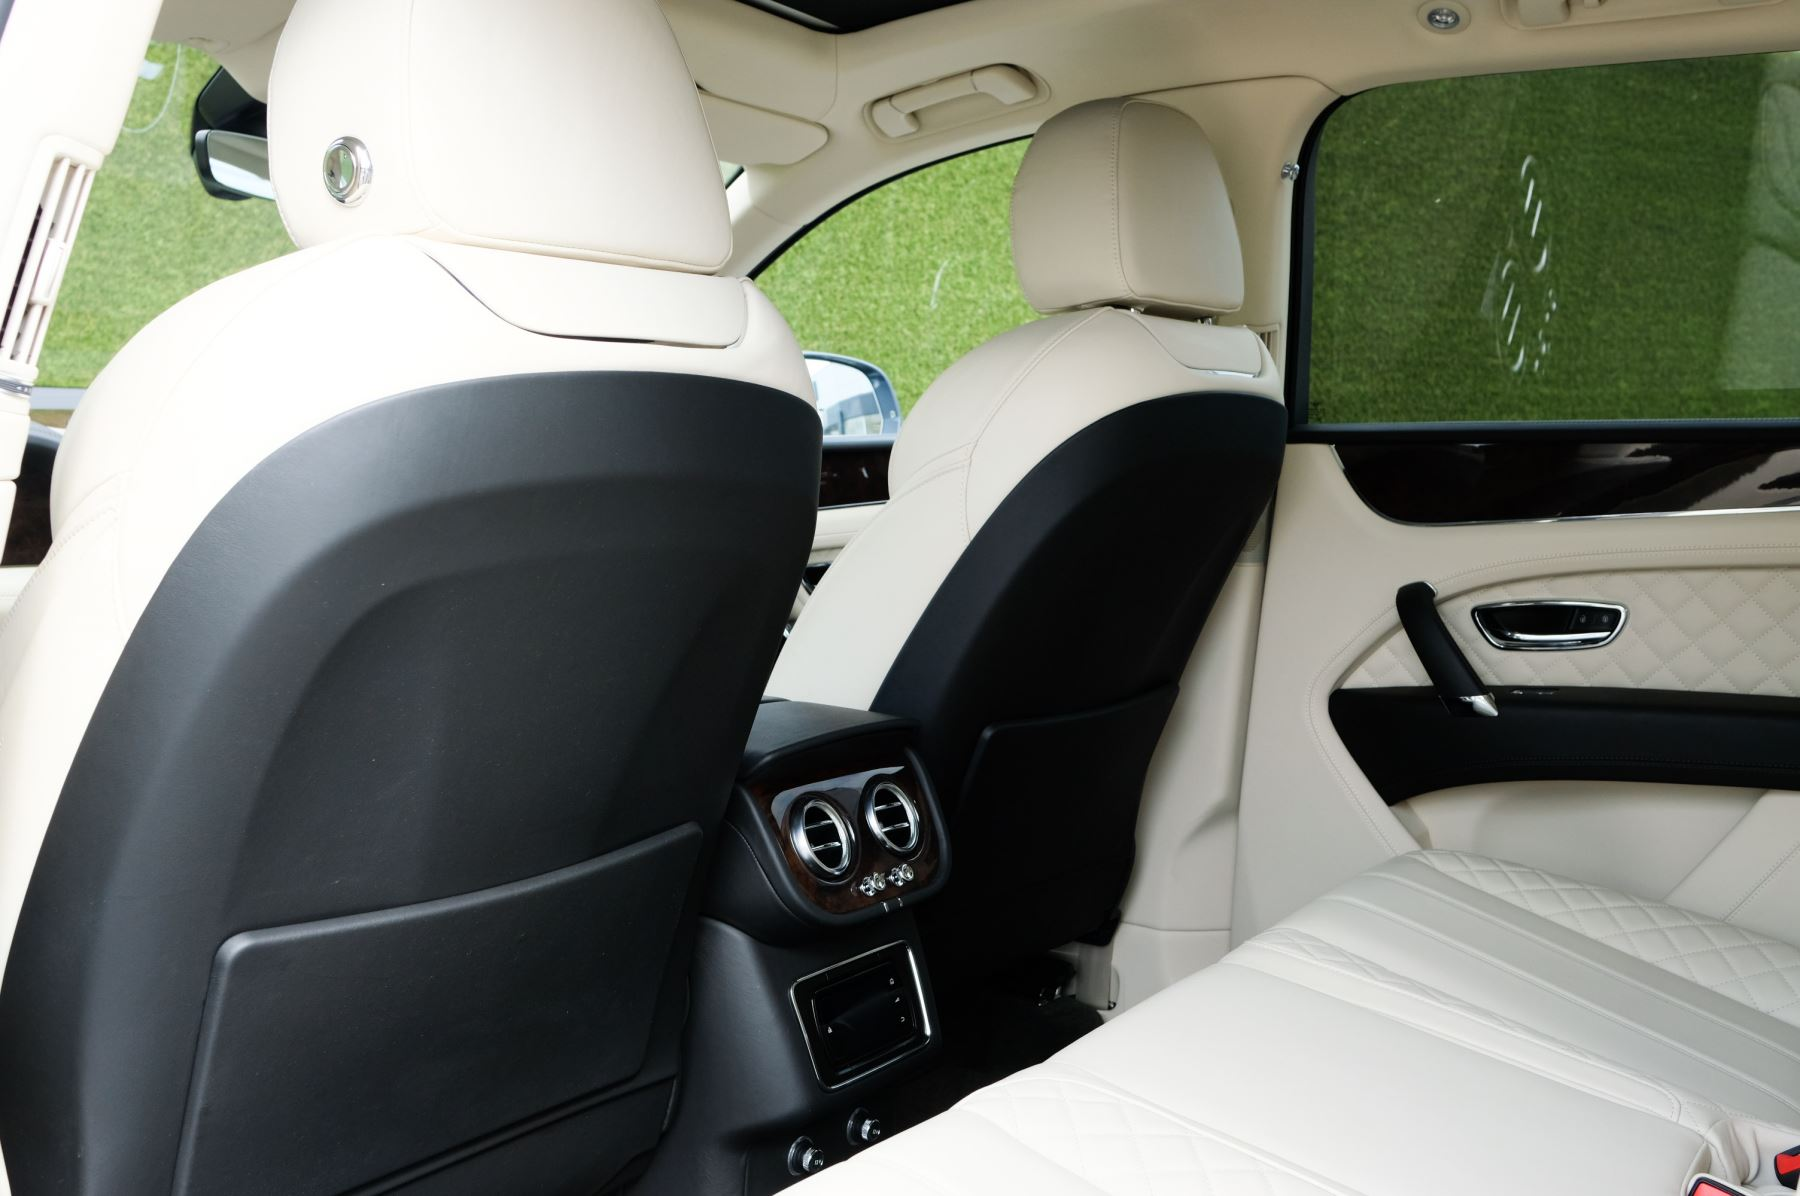 Bentley Bentayga 4.0 V8 5dr - Mulliner Driving Specification - City & Tour Specification image 15